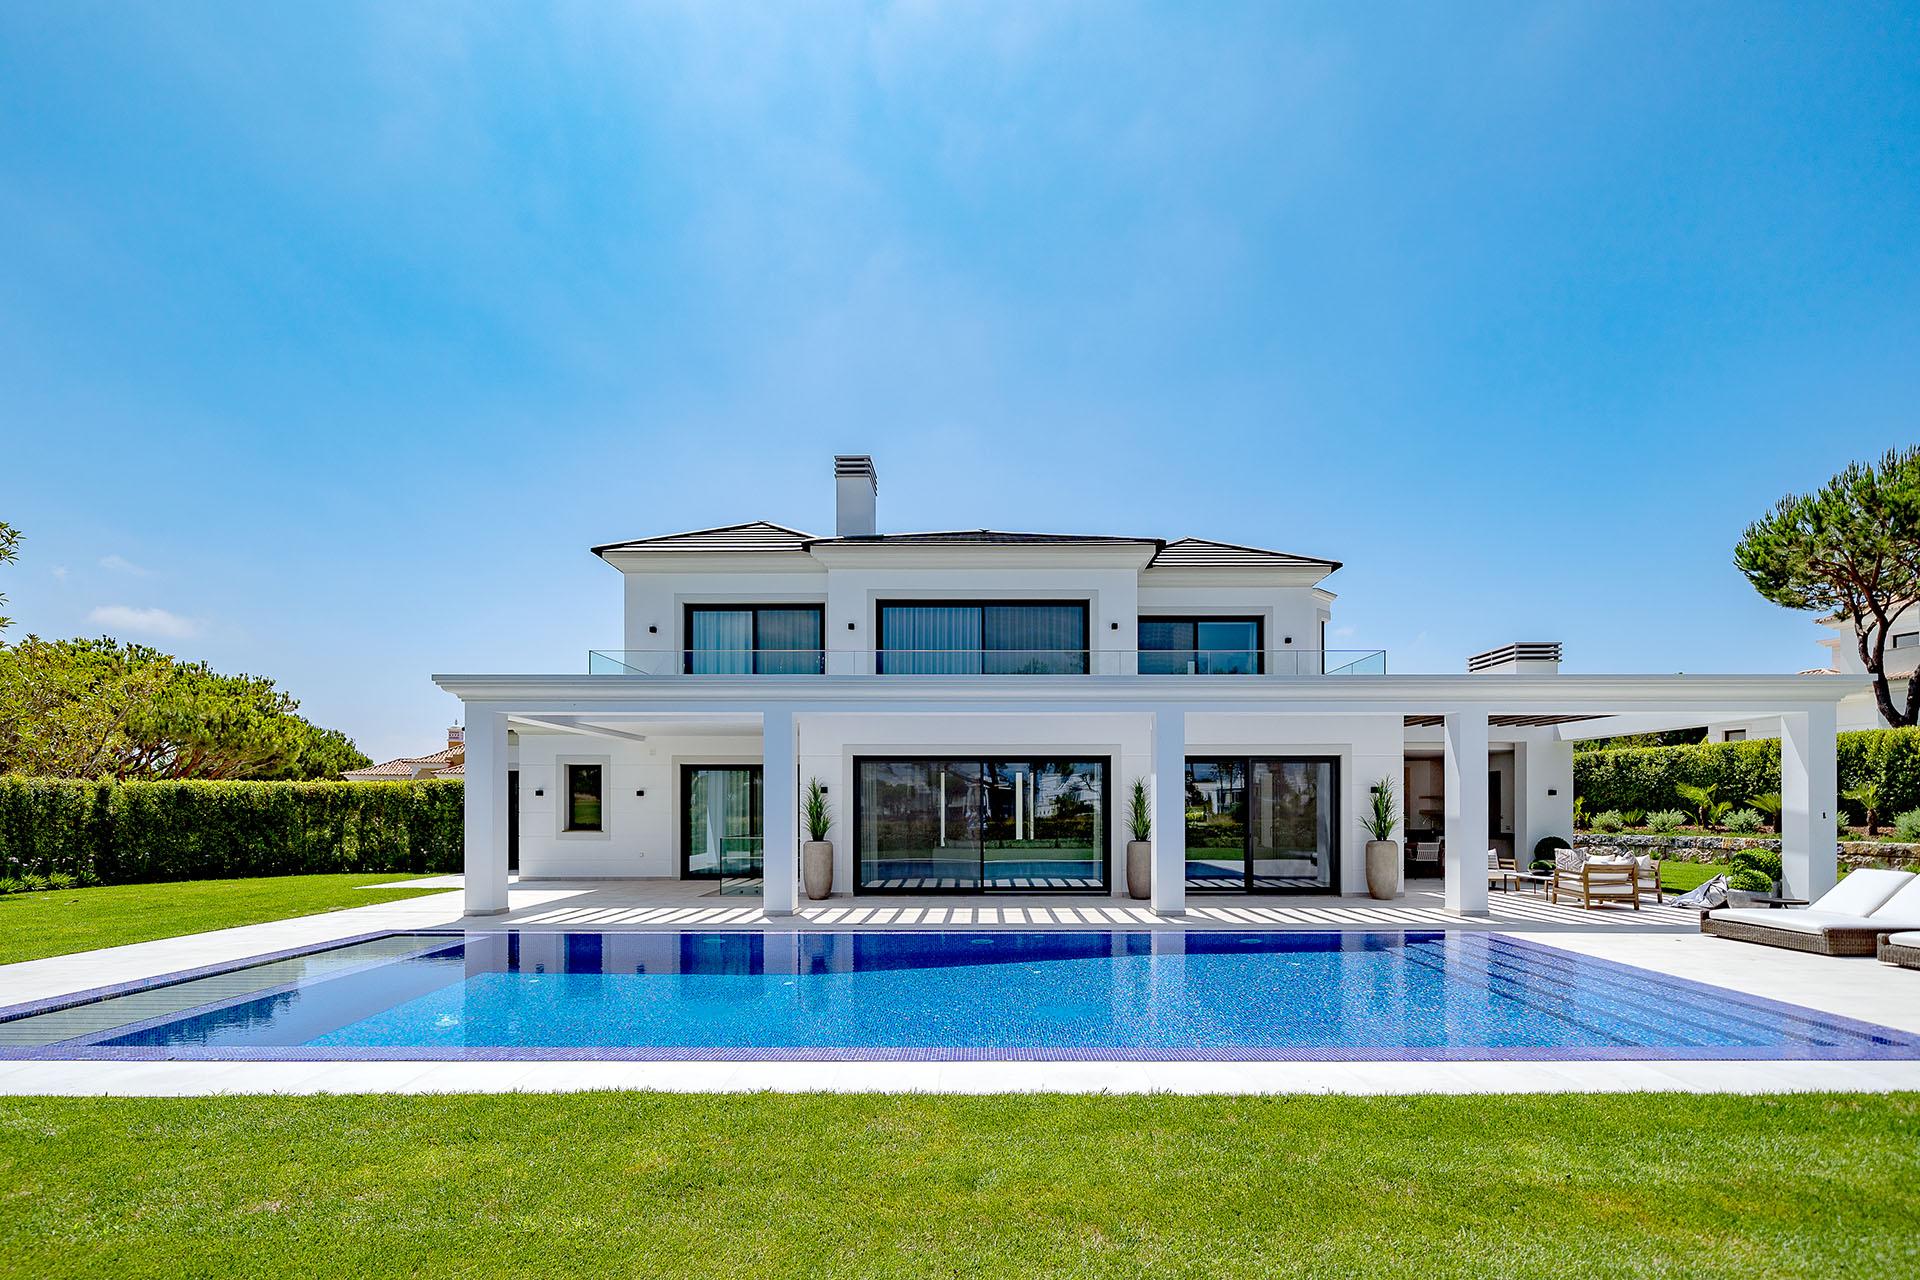 Wonderful villa with lake and fairway views